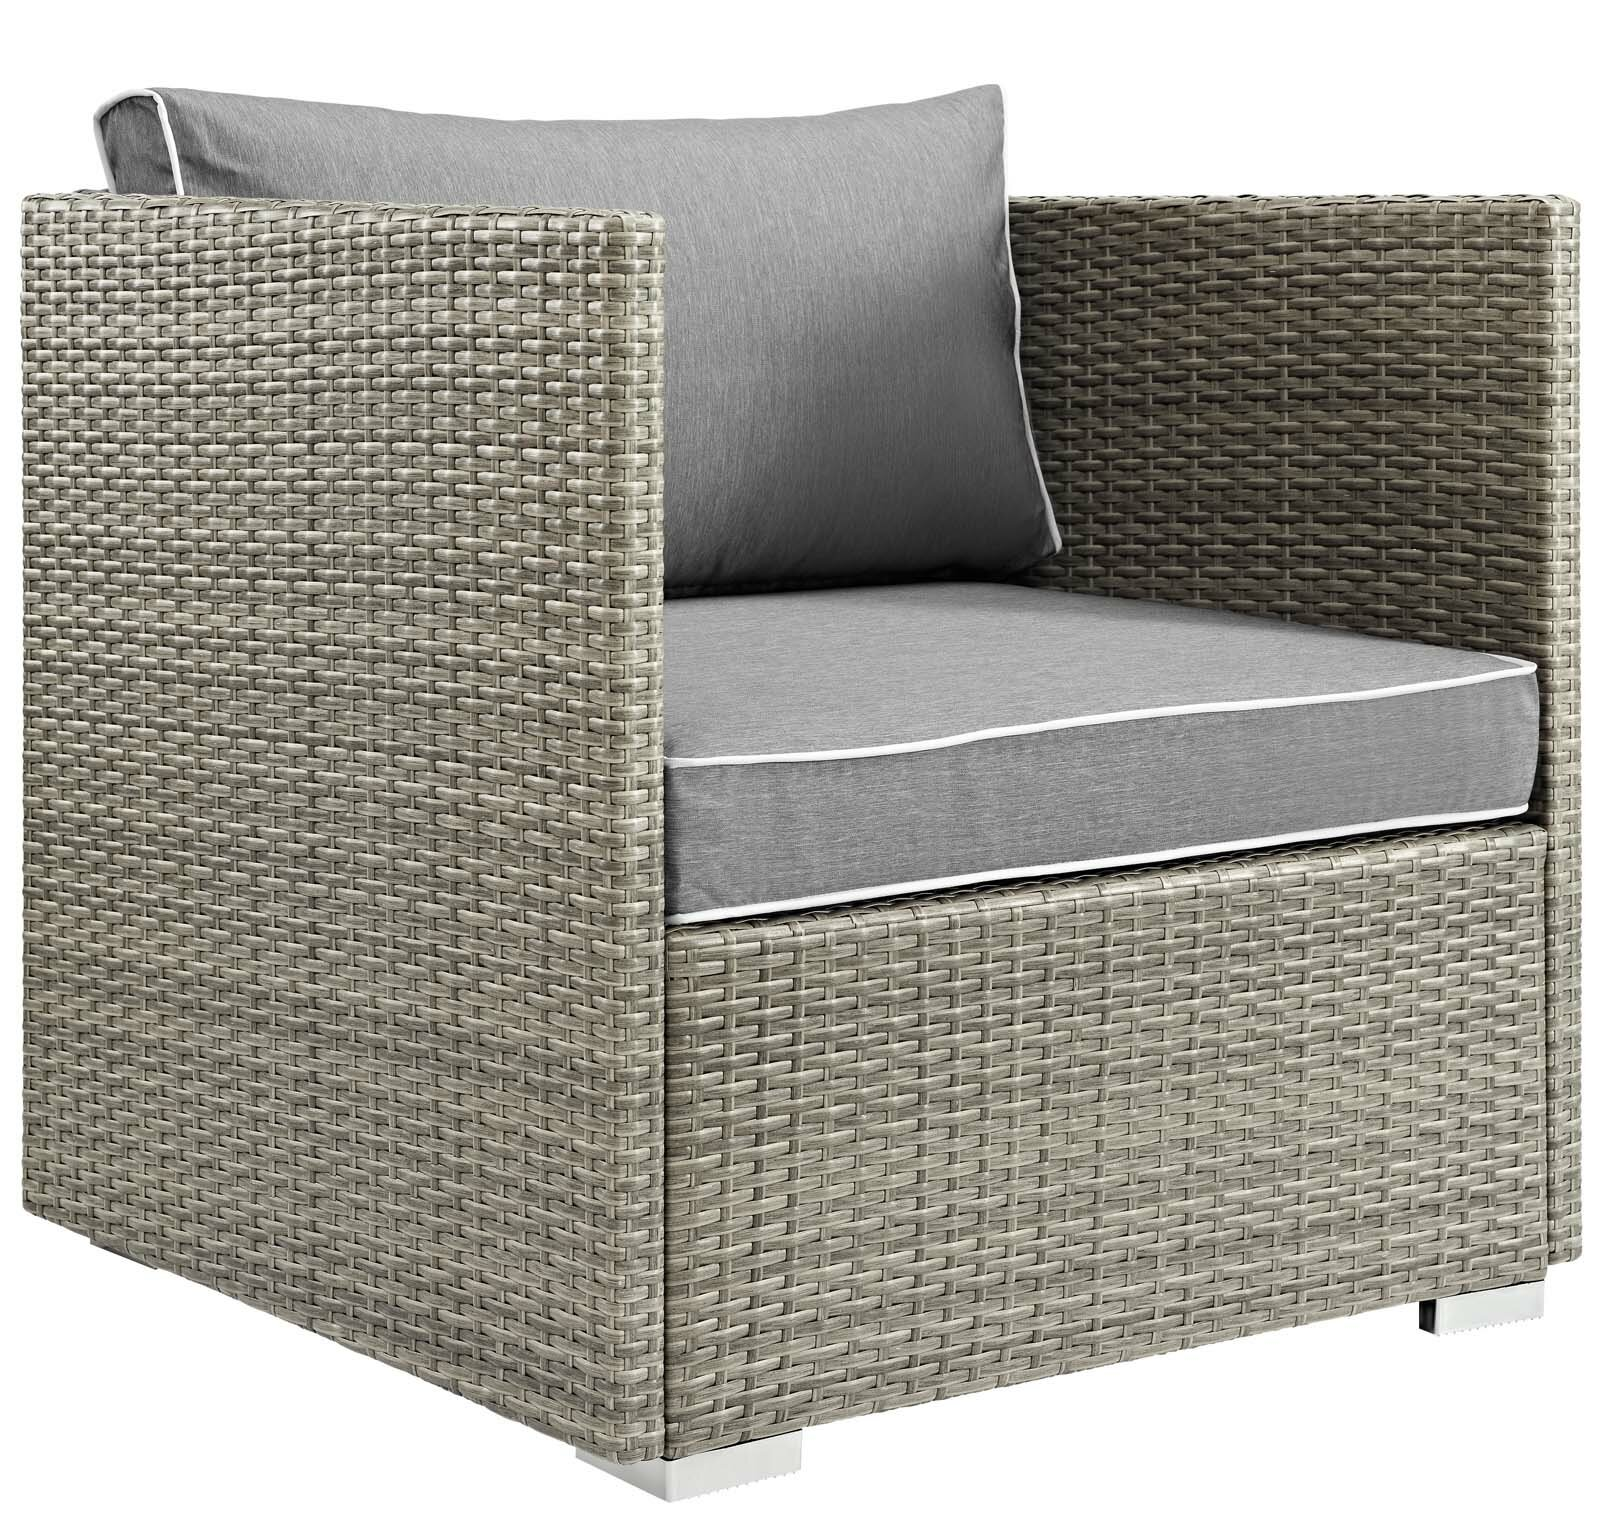 Ebern Designs Berberia Patio Dining Chair With Cushion Wayfair